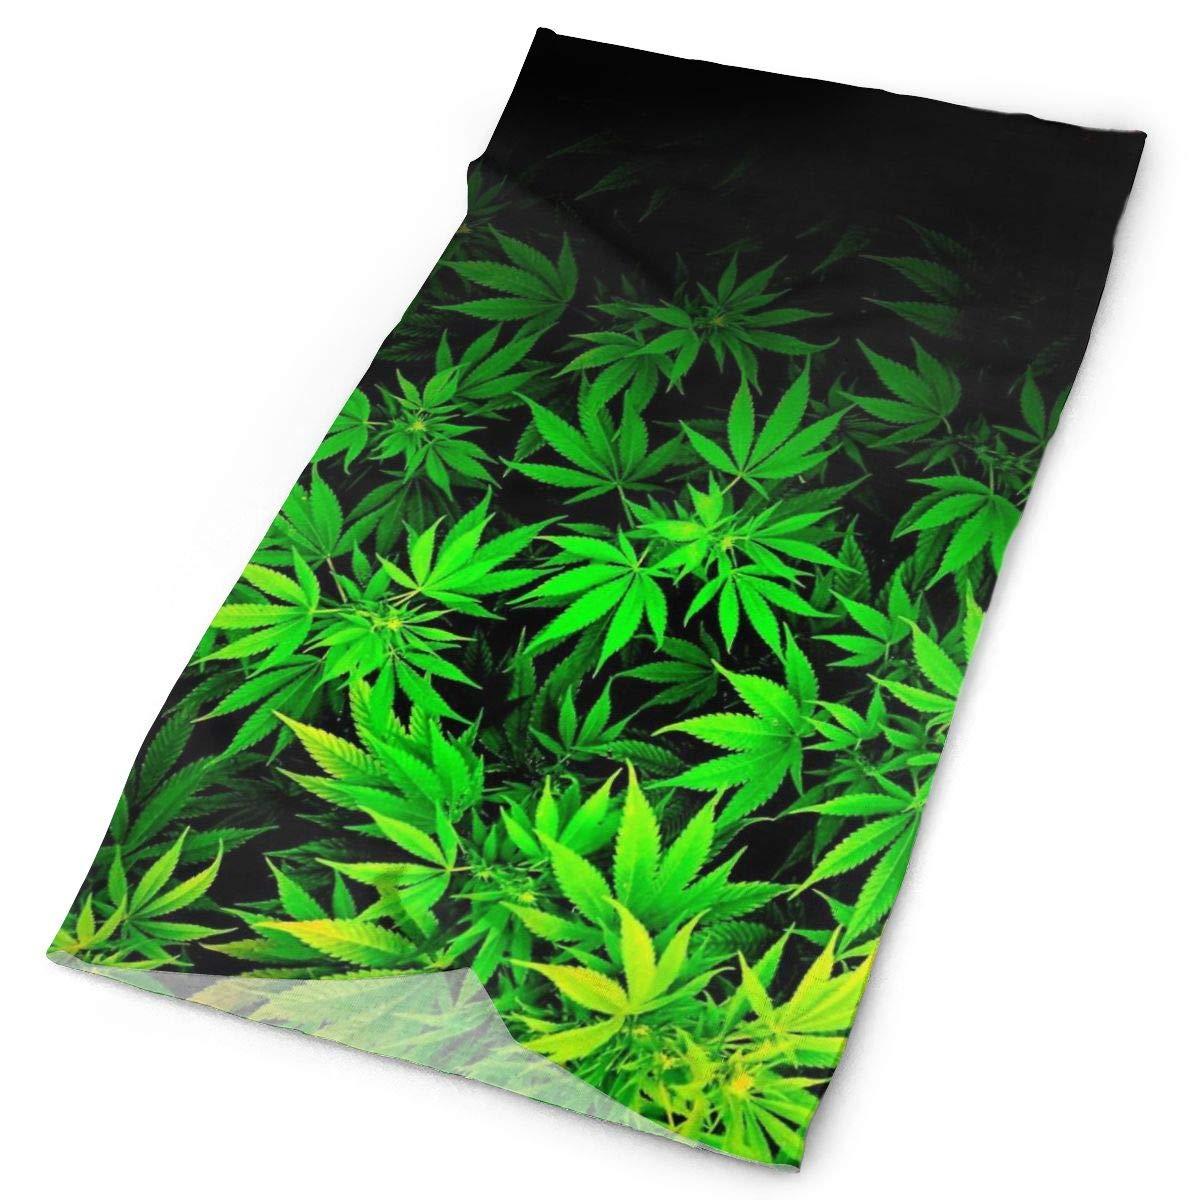 Verde claro impresionante sombrero de hojas de marihuana-16 maneras de llevar incluyendo diadema/polainas de cuello/Bandana/revestimiento de casco/pasamontañas/magia